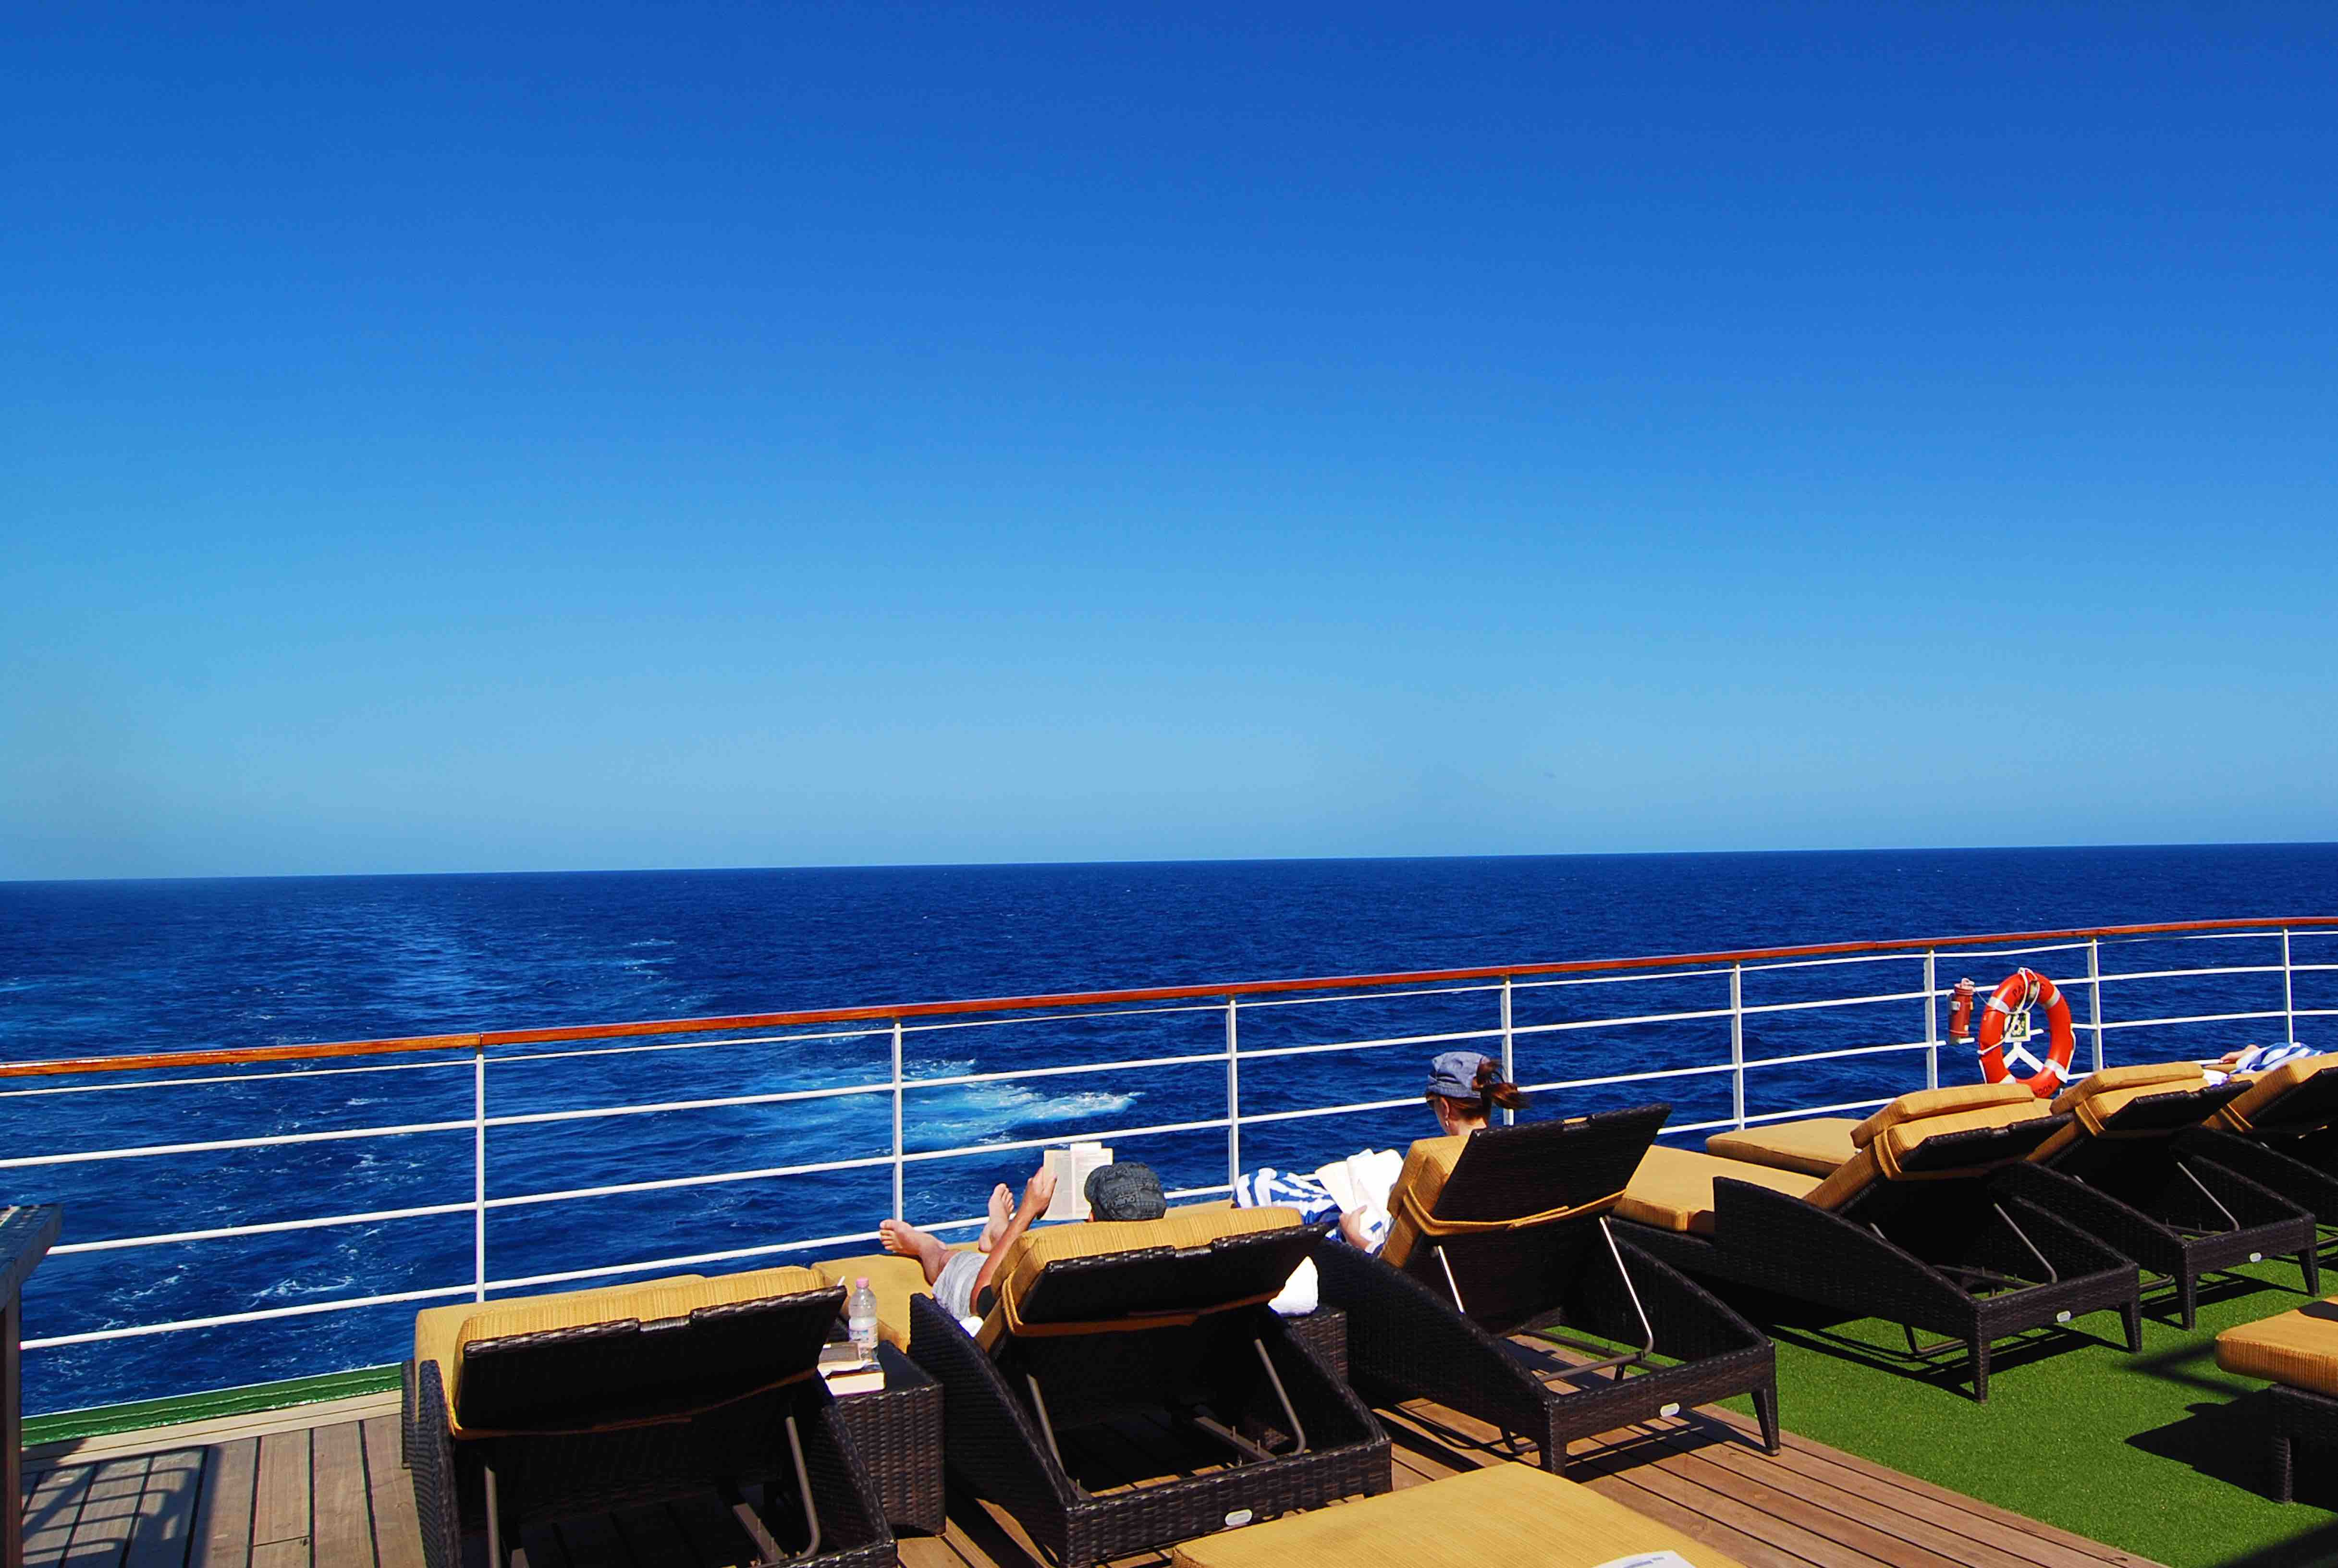 Why Cruises Are So Popular in Australia